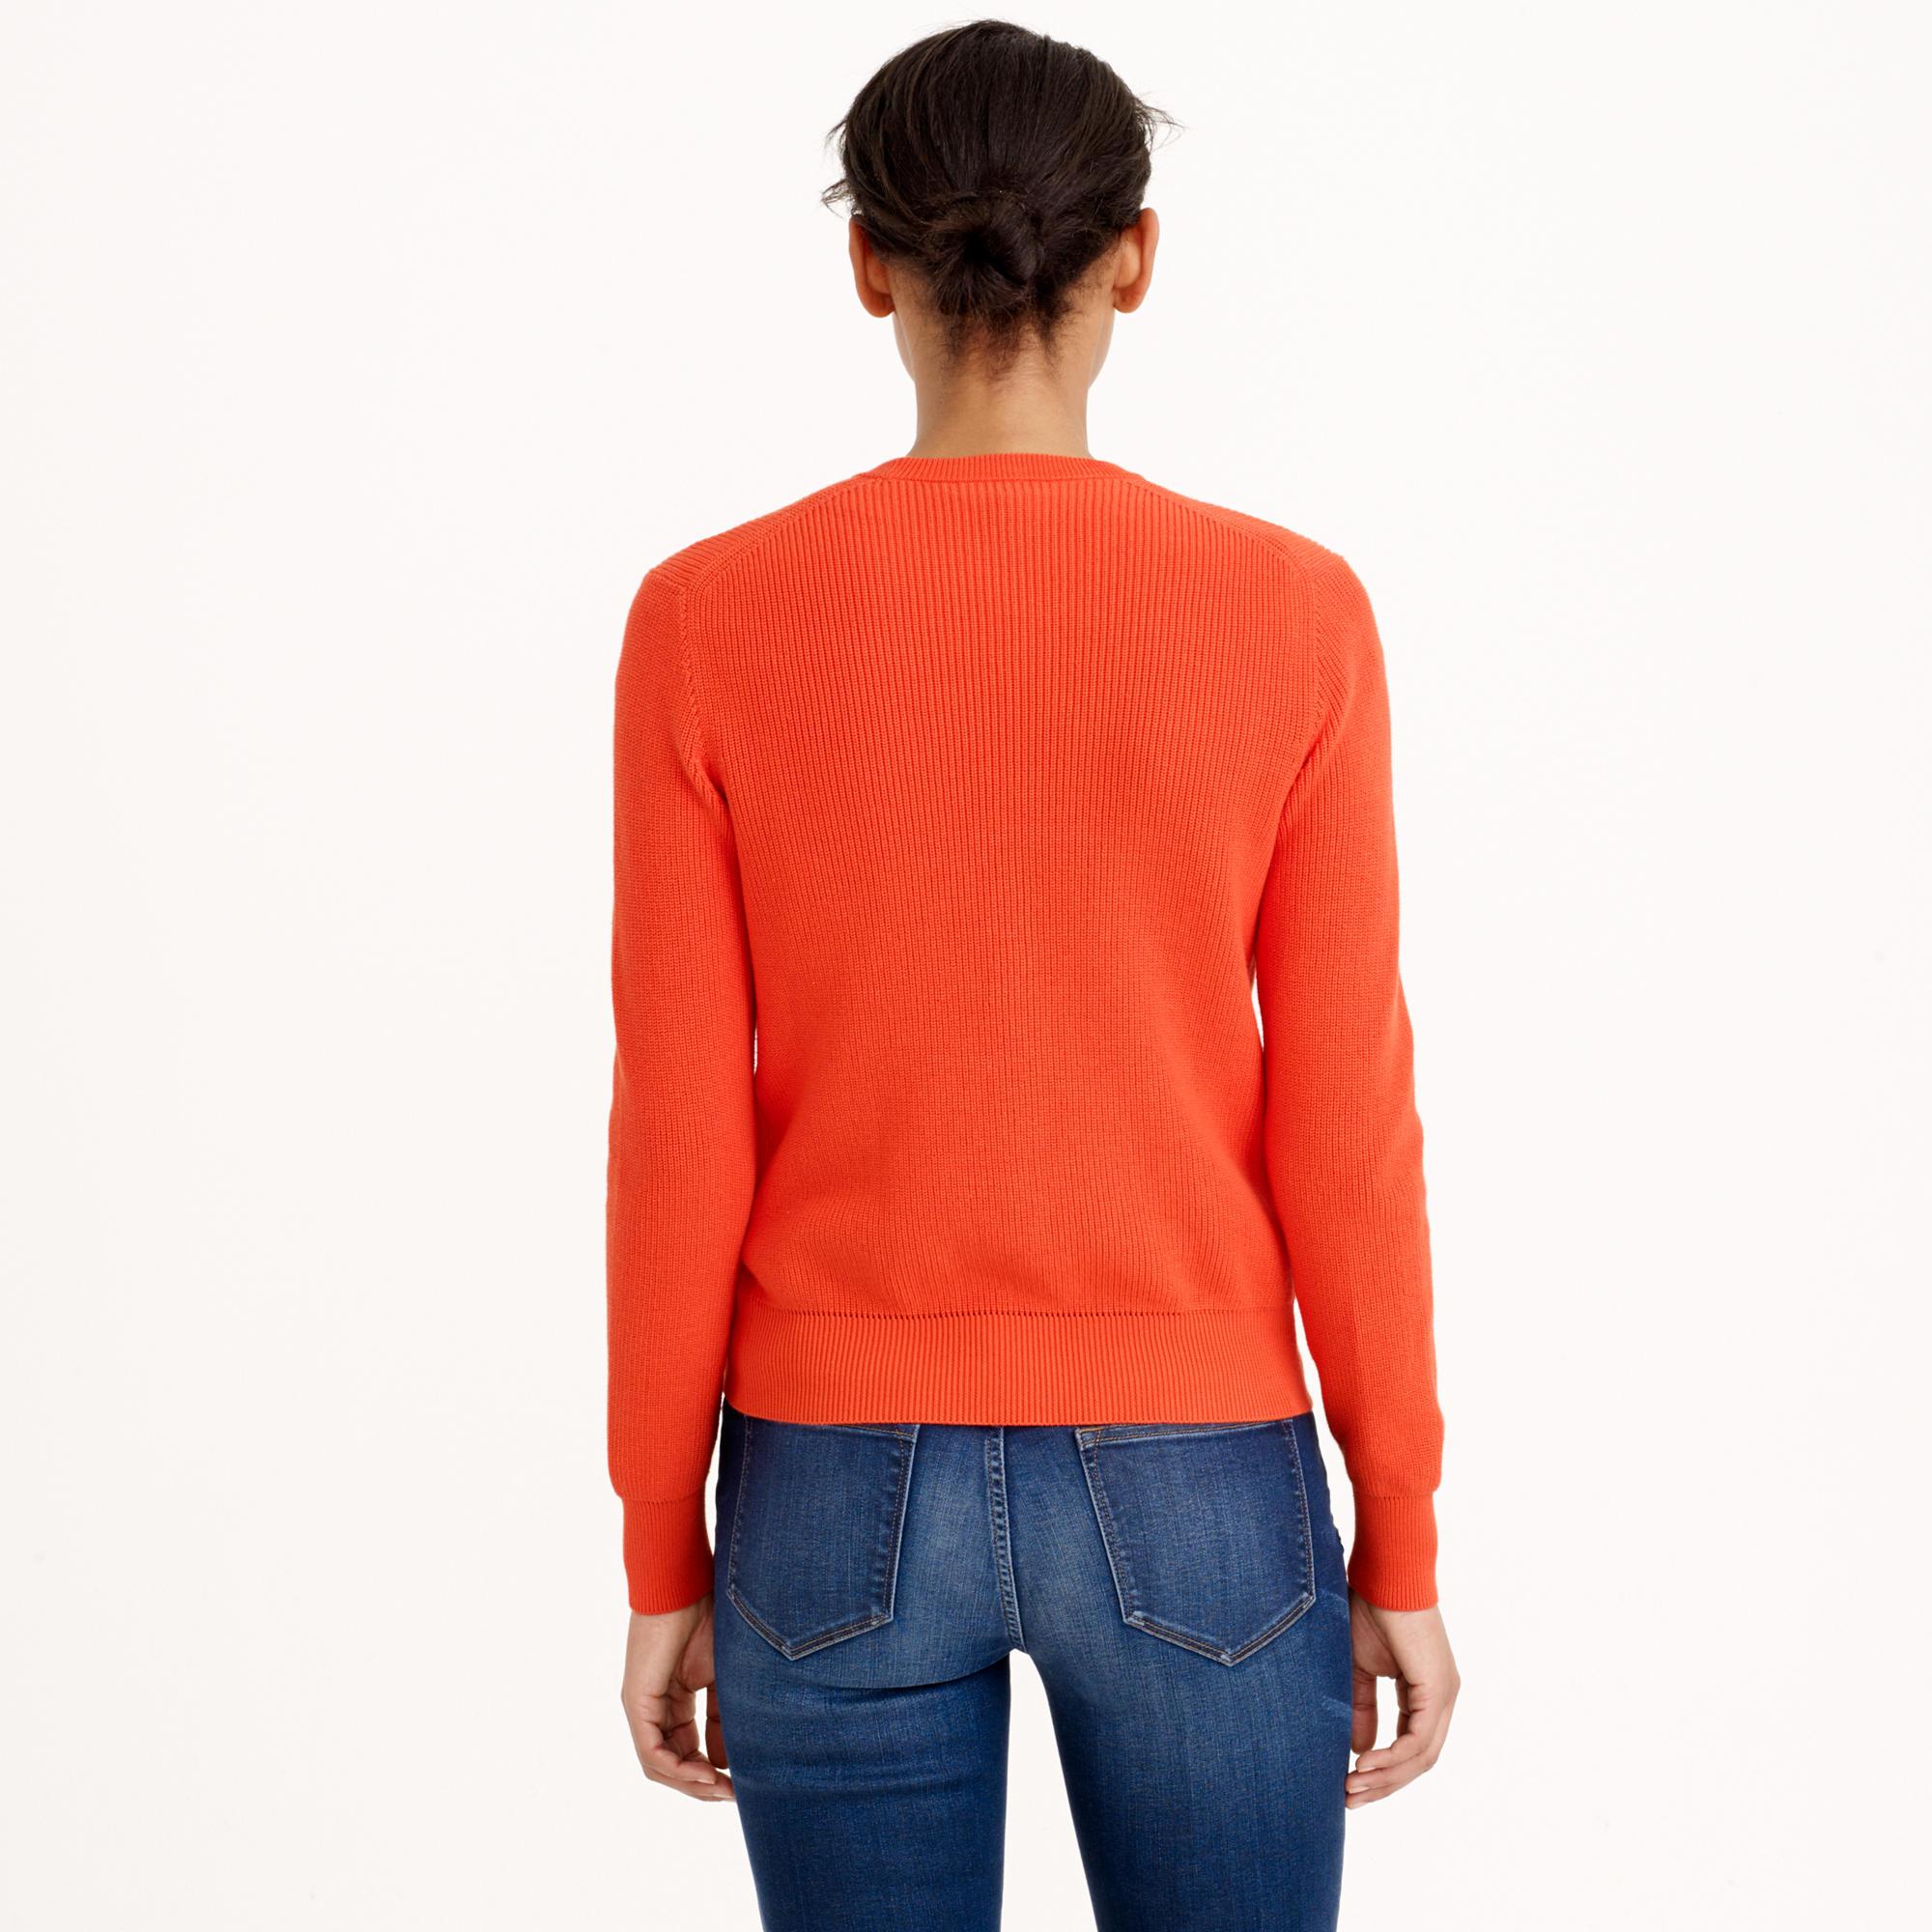 J.crew Ribbed Cotton Cardigan Sweater in Orange | Lyst